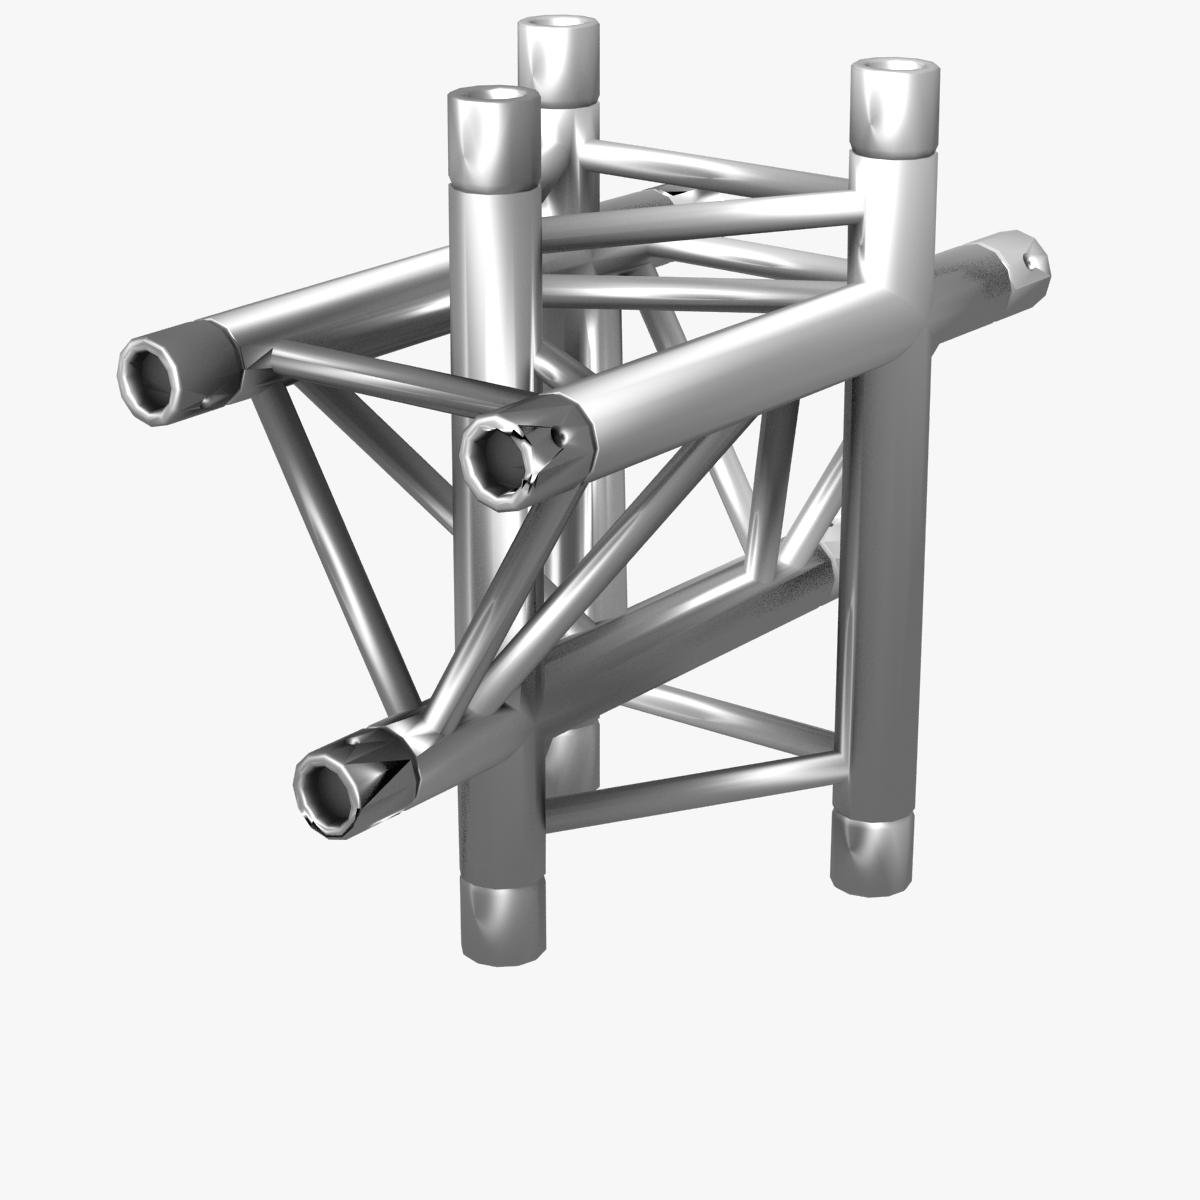 triangular trusses (collection 55 modular pieces) 3d model 3ds max dxf fbx c4d dae texture obj 216225